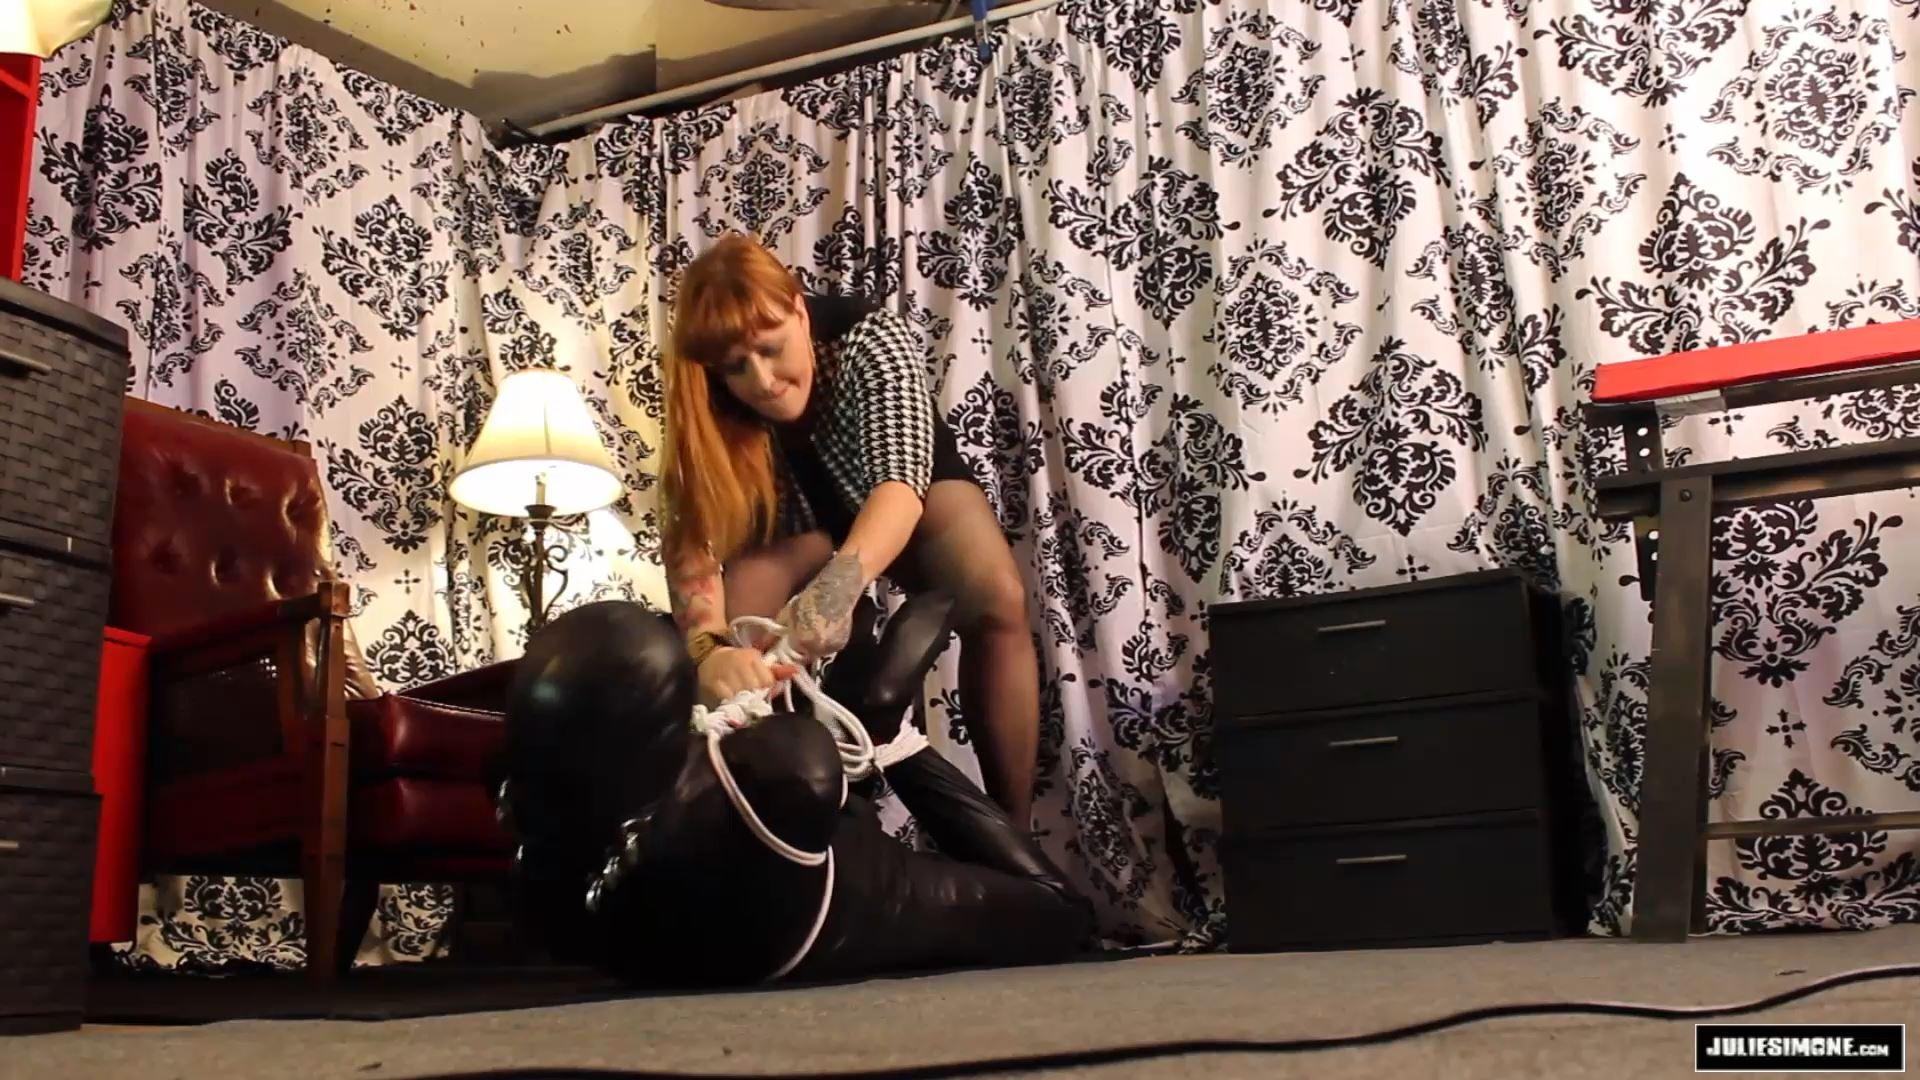 Julie Simone In Scene: Hogtied Zentai White Rope - JULIESIMONE - FULL HD/1080p/MP4